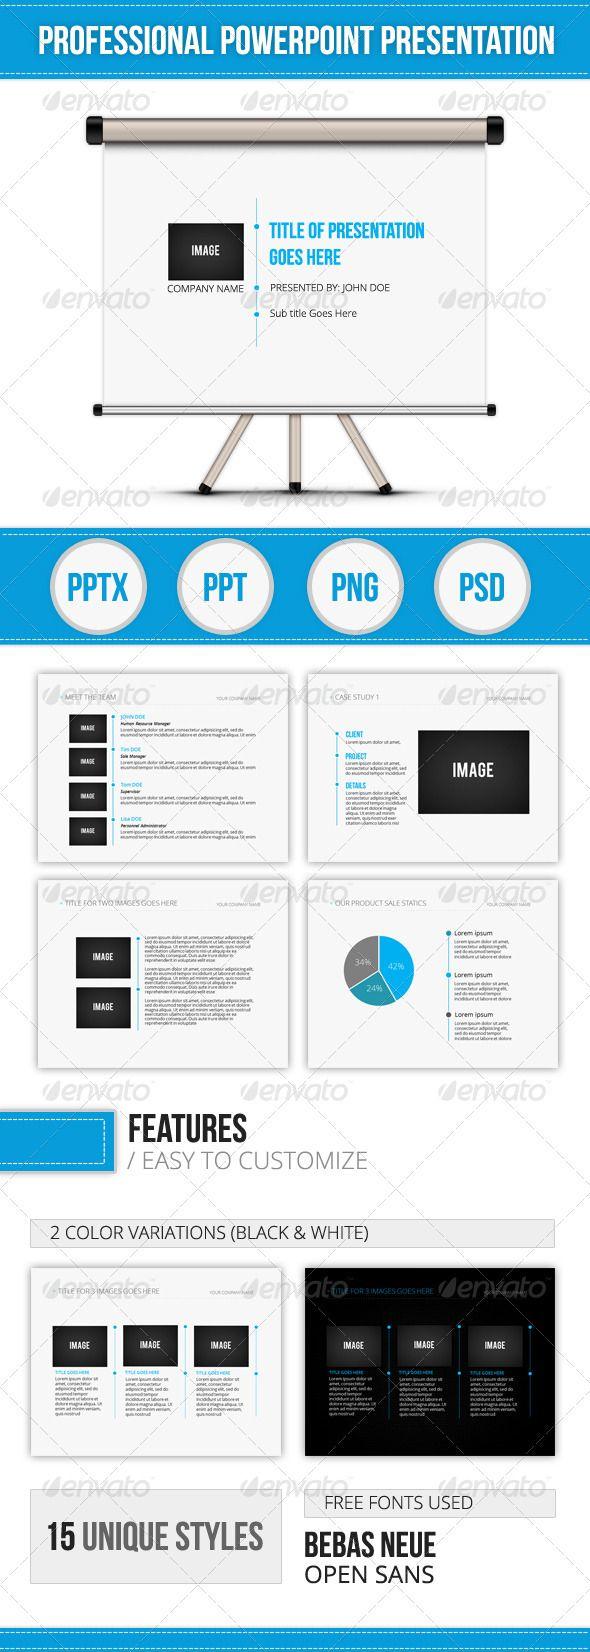 17 Best images about Apresentações PPT on Pinterest   Graphics ...